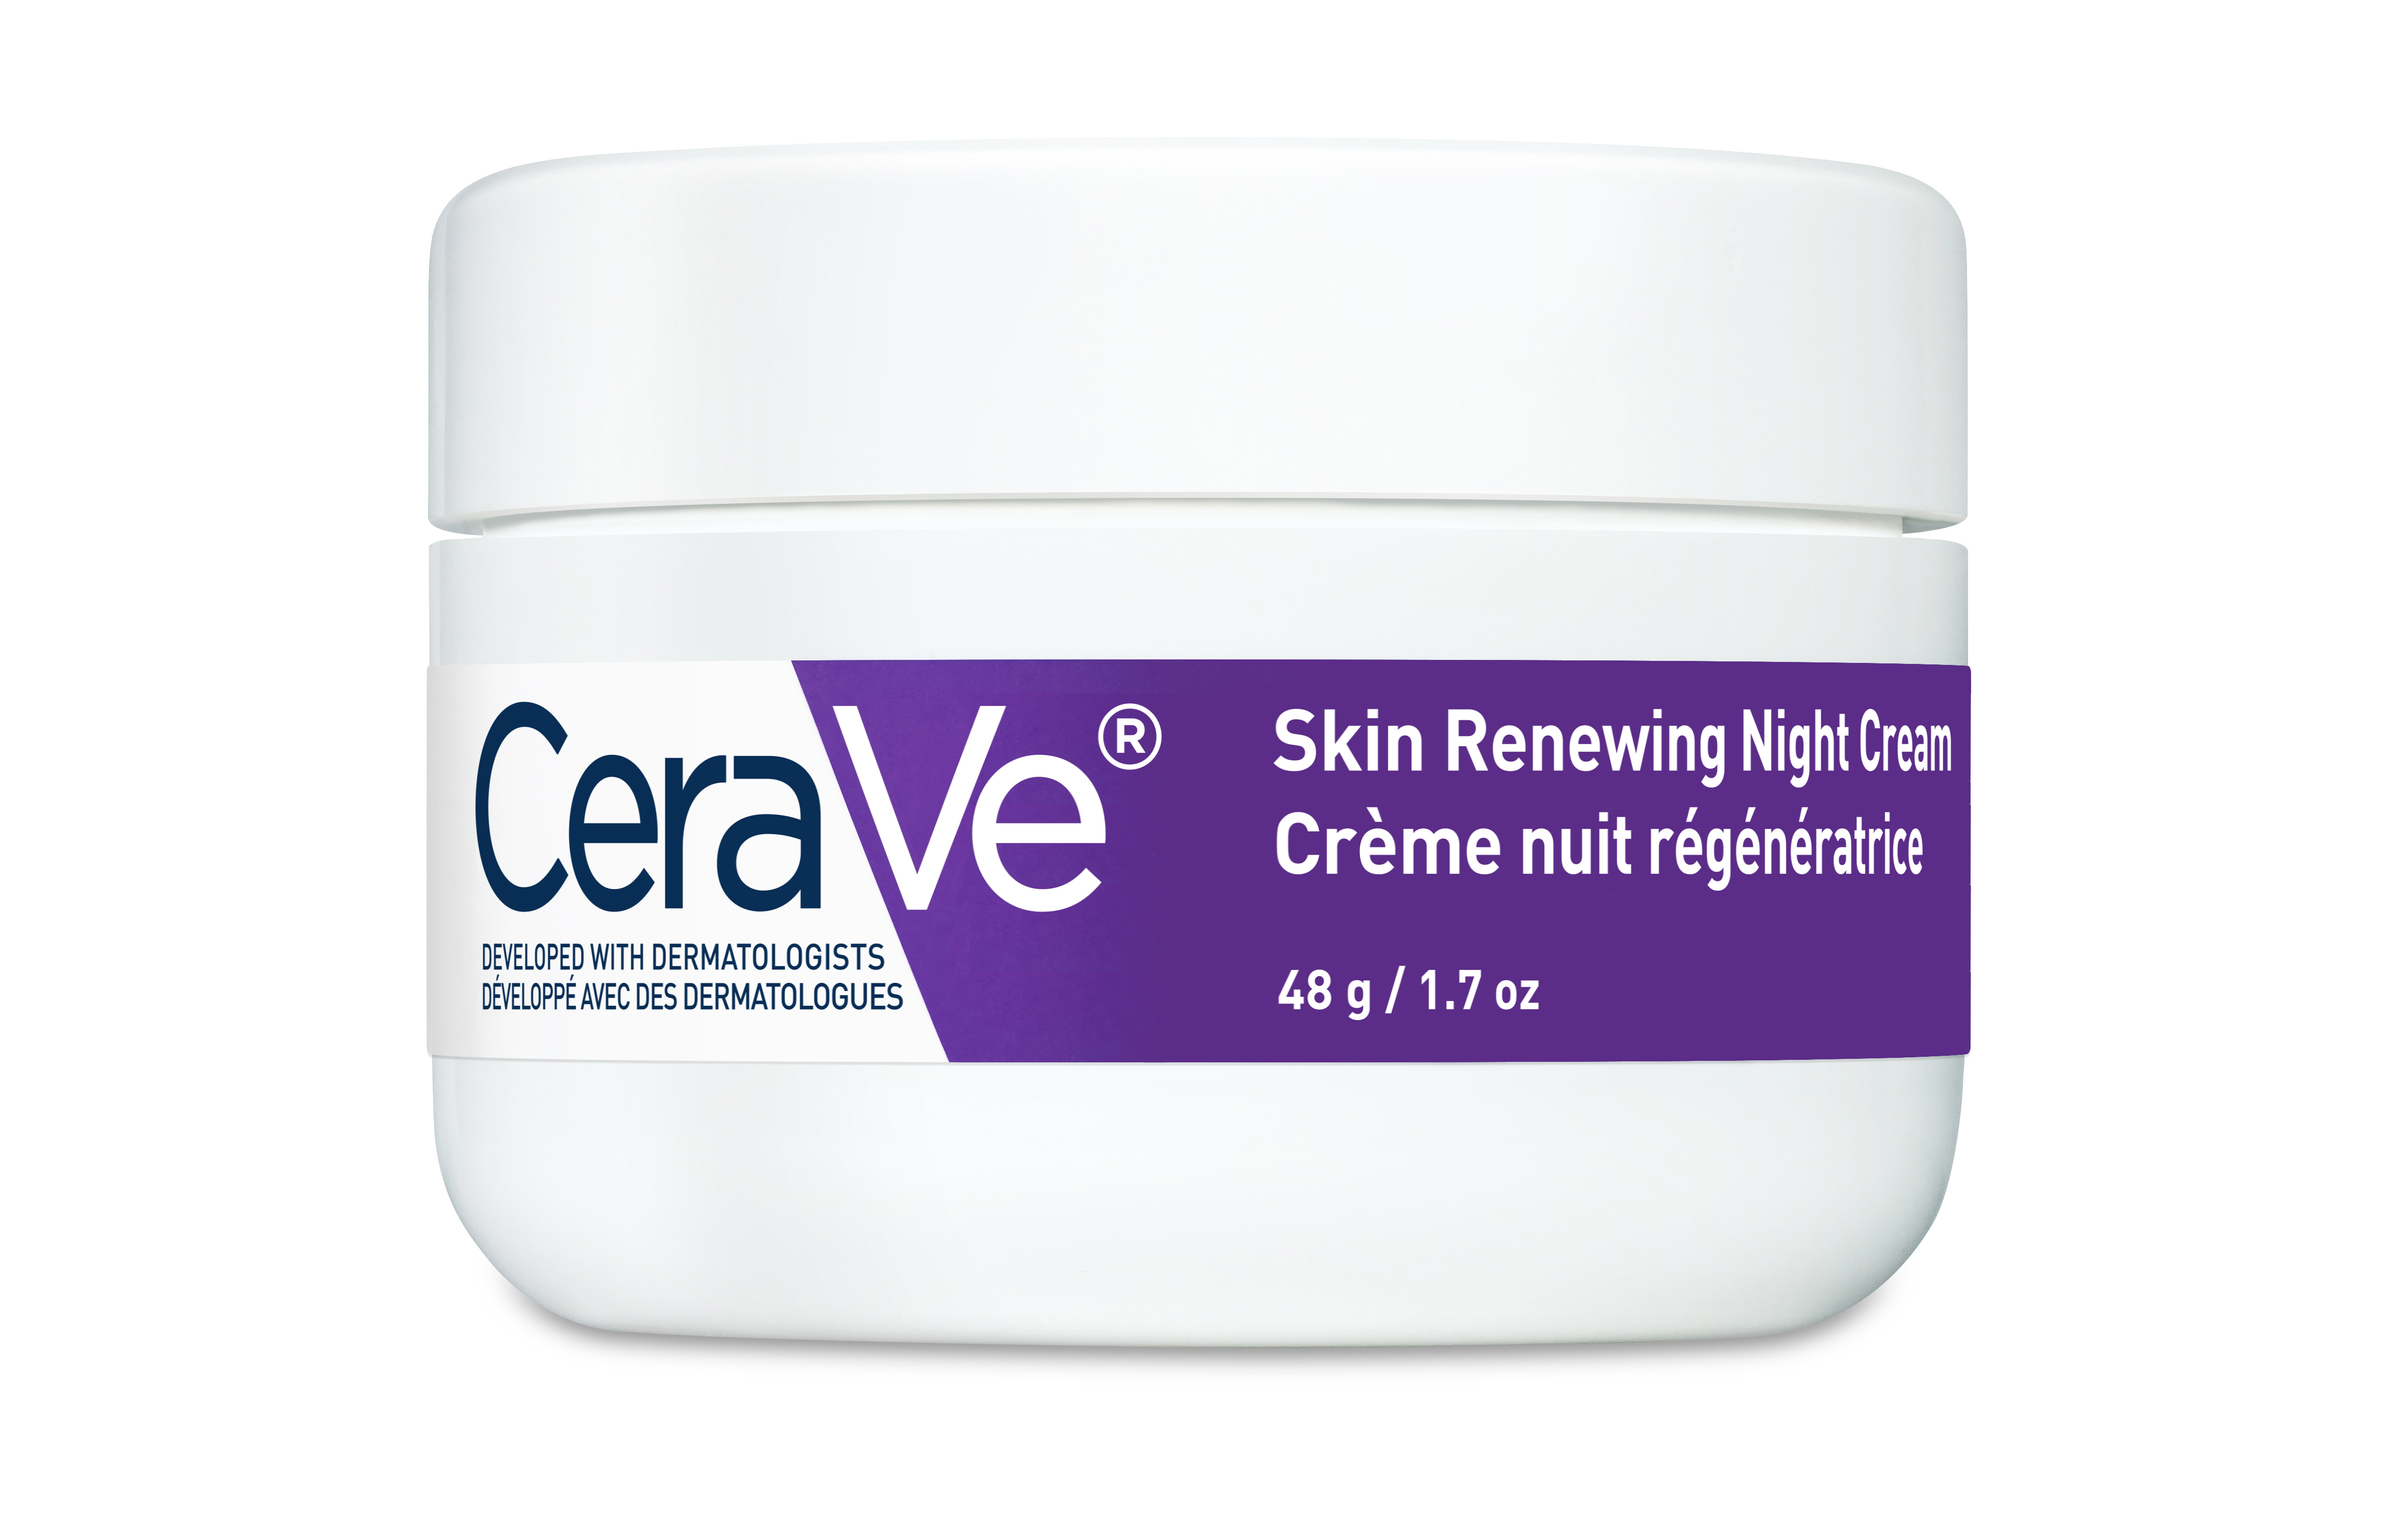 Cerave night